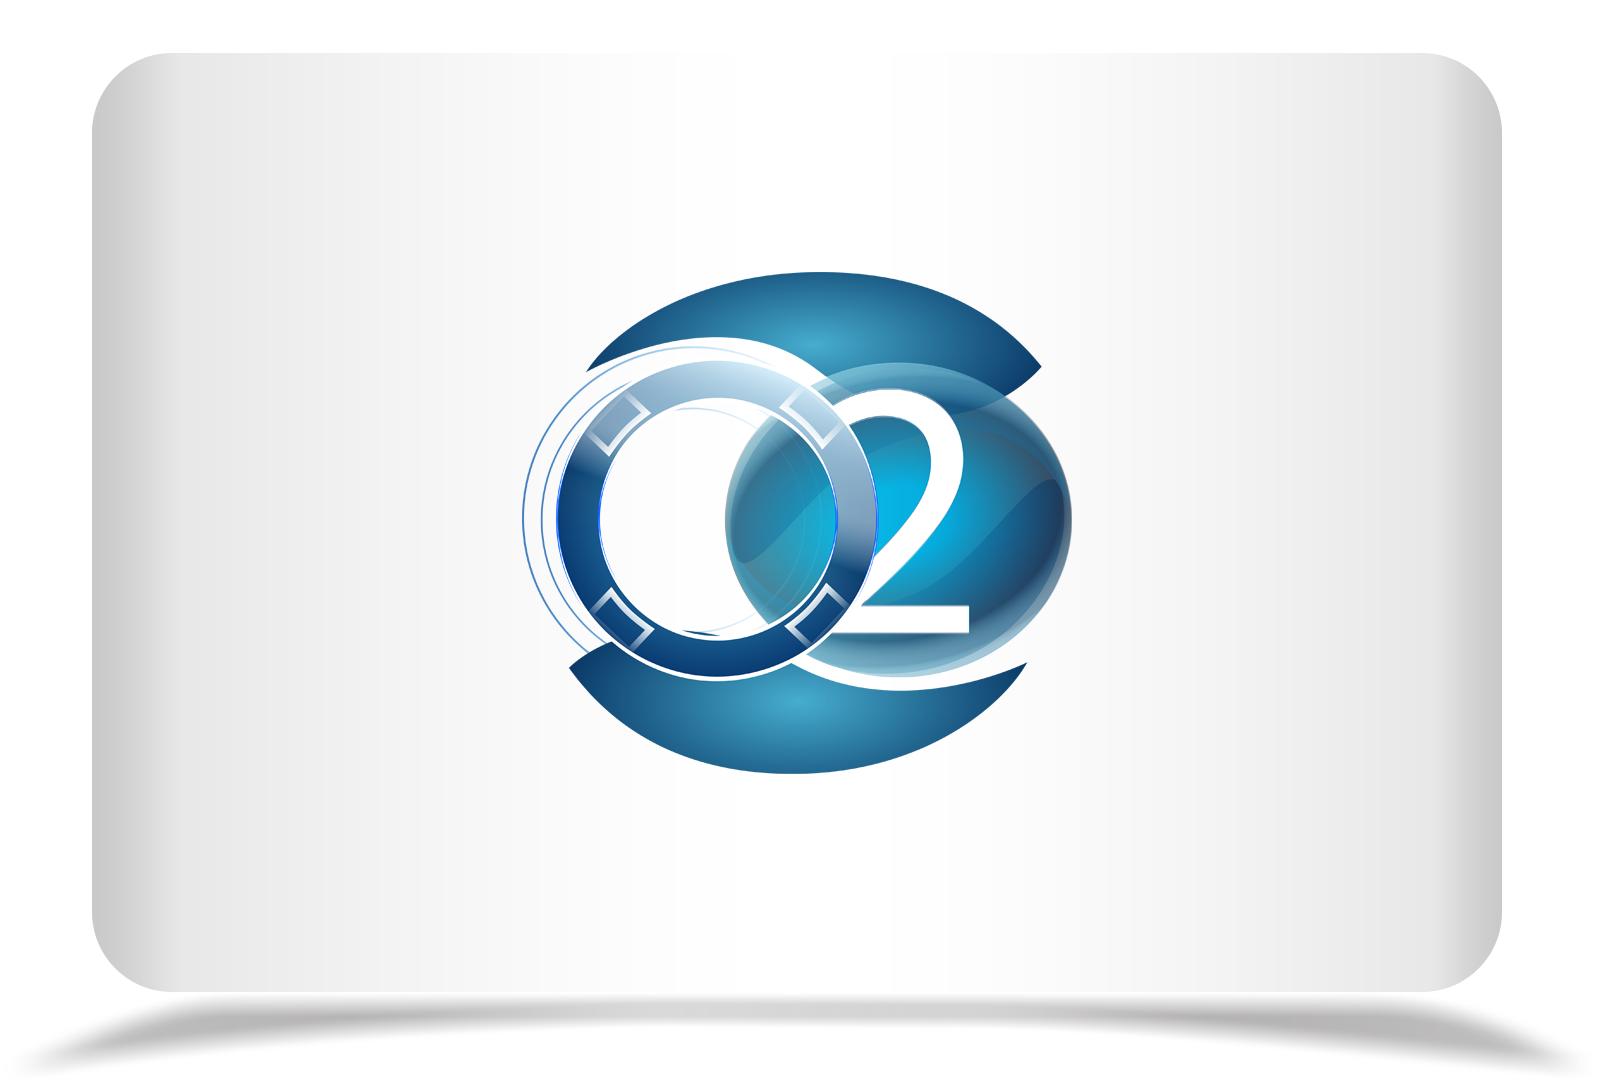 Logo Design by Rozsa Matyas - Entry No. 178 in the Logo Design Contest Artistic Logo Design for O2.